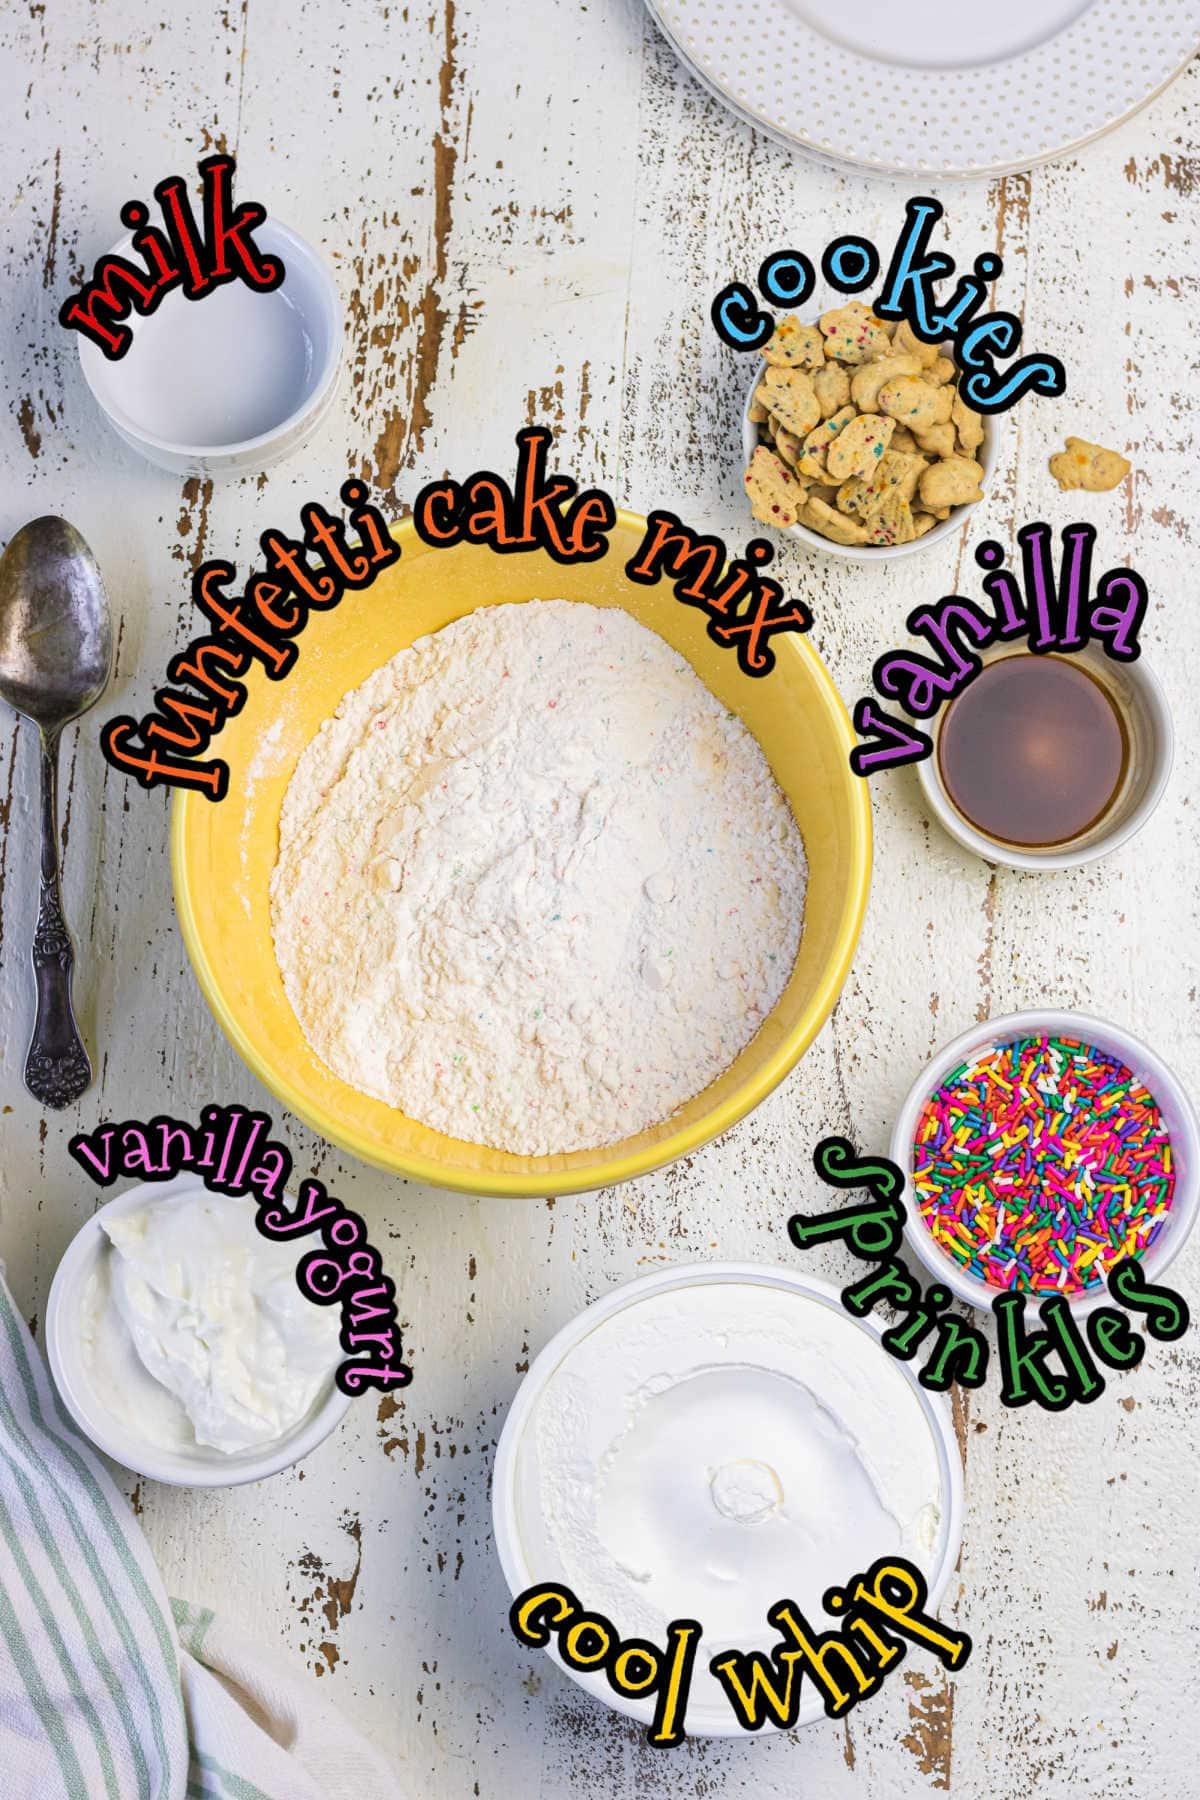 Ingredients for funfetti dip.